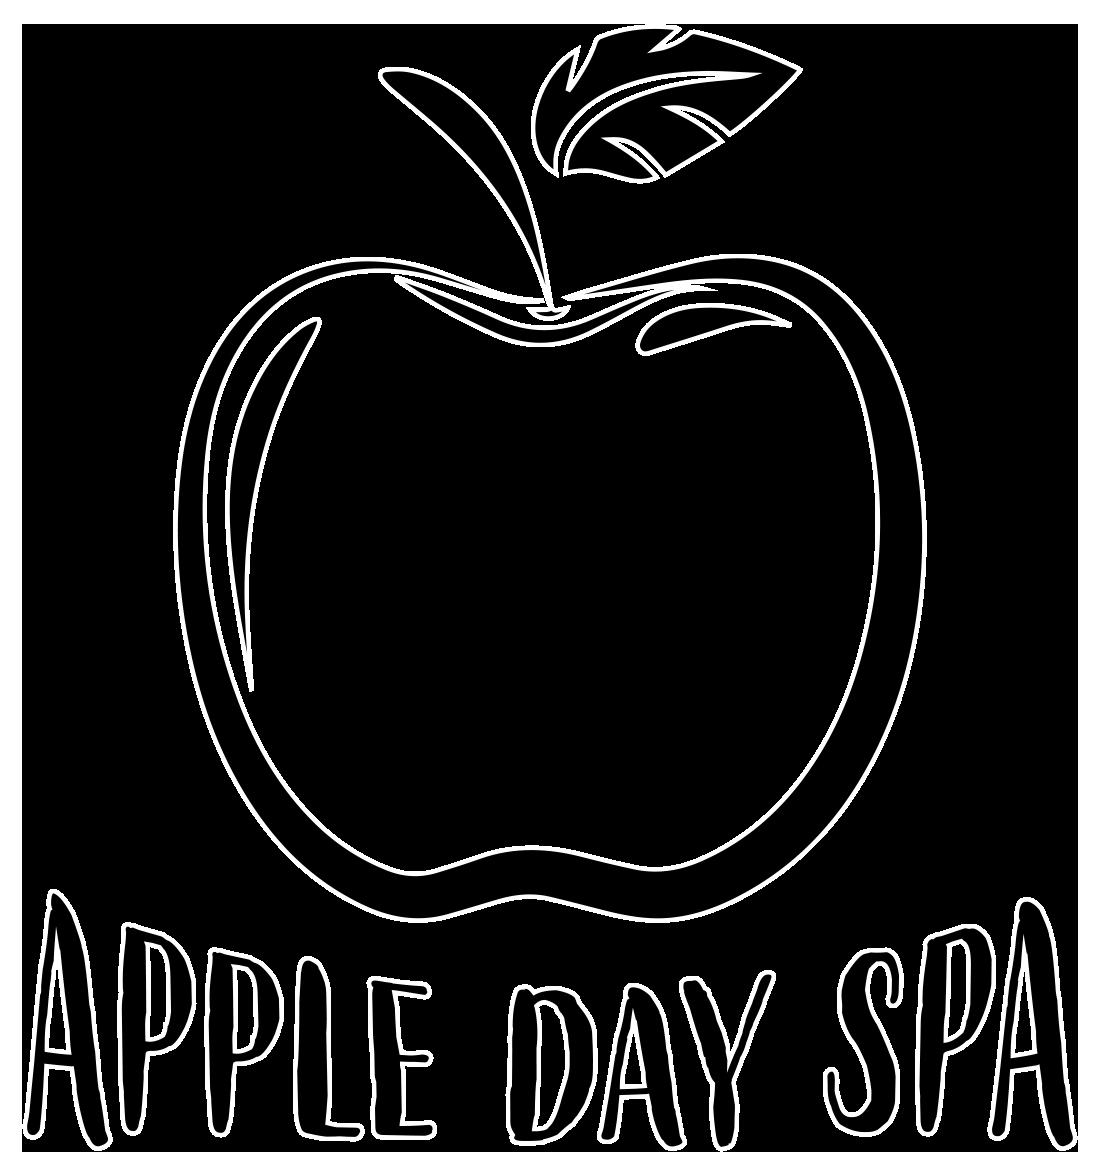 Apple Day Spa & Salon | Best Hair Salon in Honesdale, PA